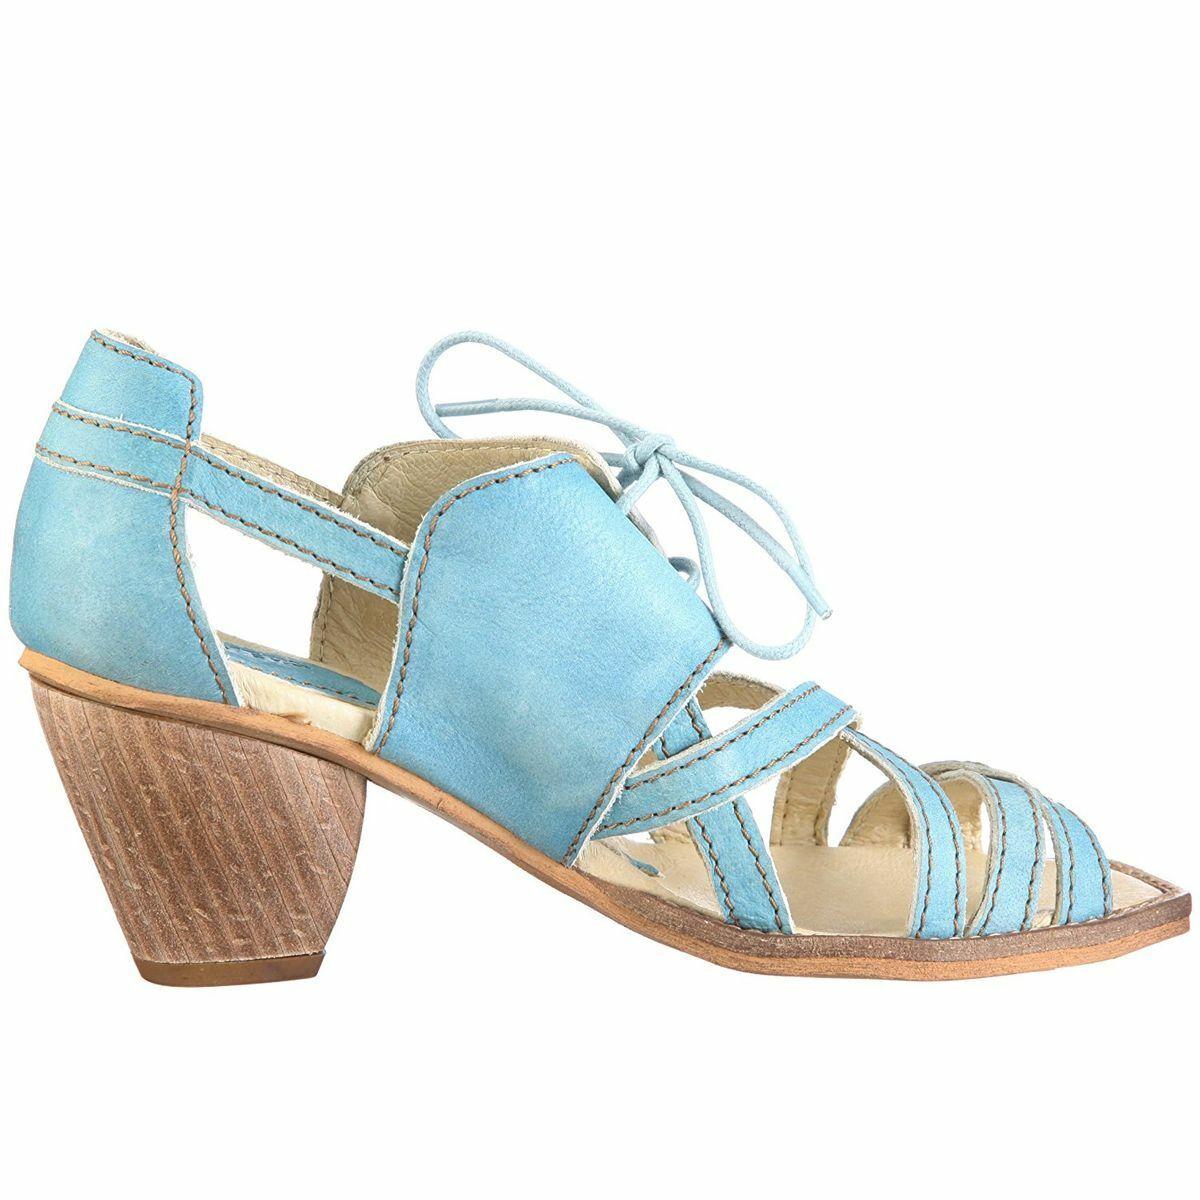 Rovers sandalias de cuero azul Lina 23011